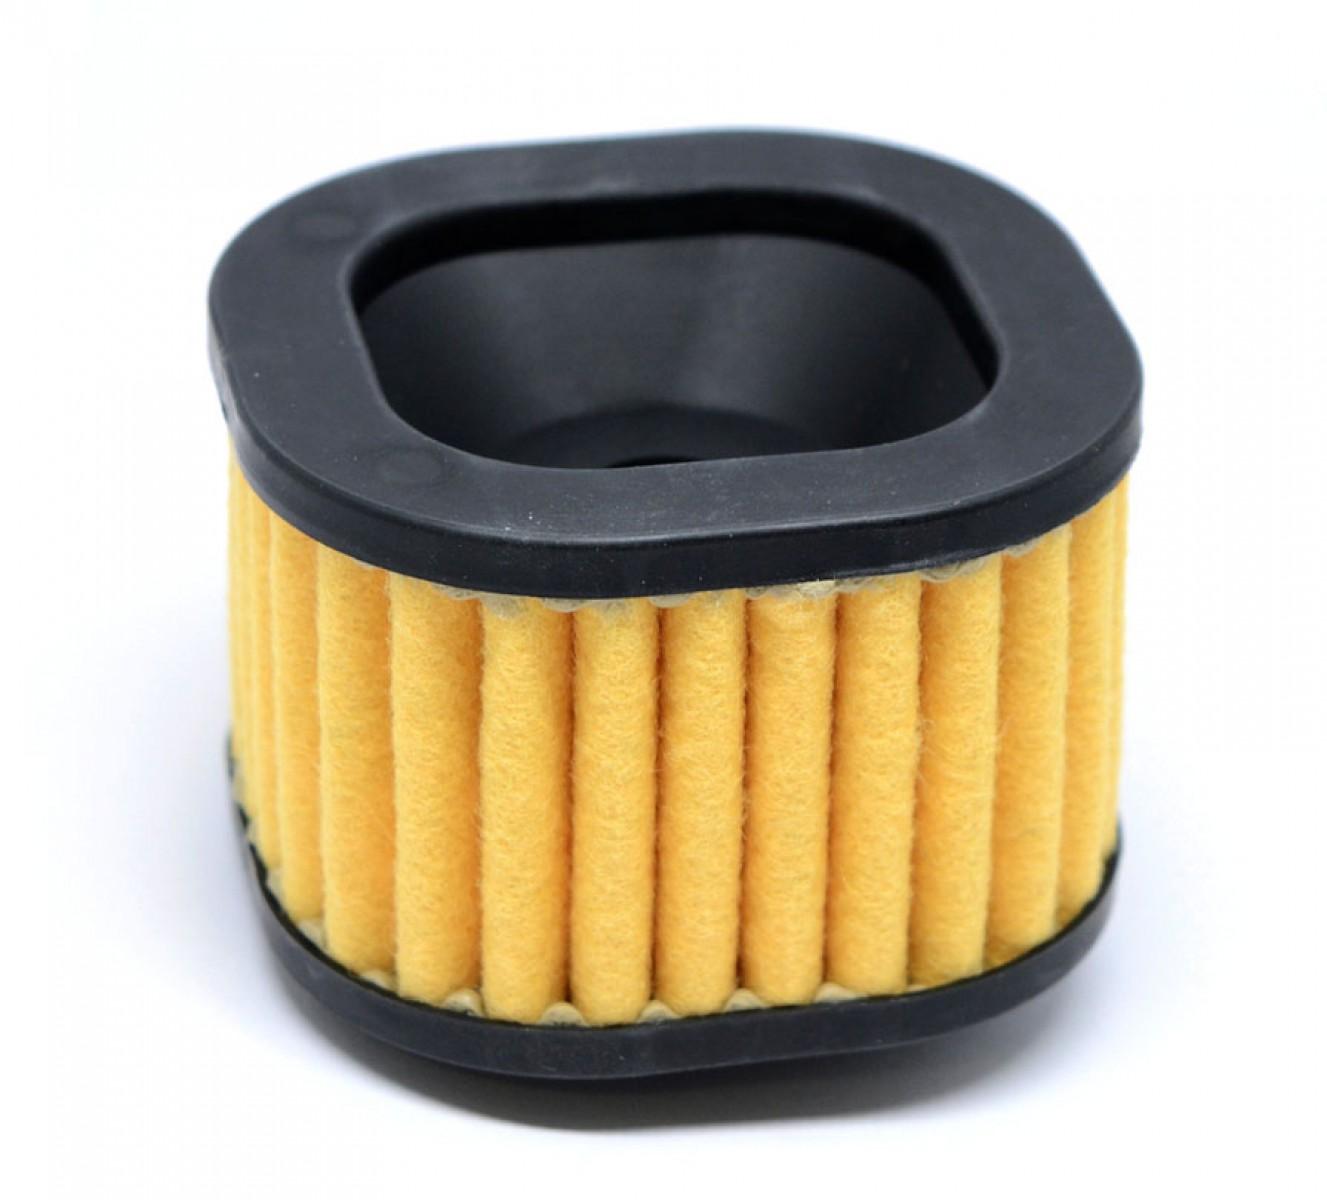 Vzduchový filter typ 2 Jonsered CS2165 CS2165 EPA